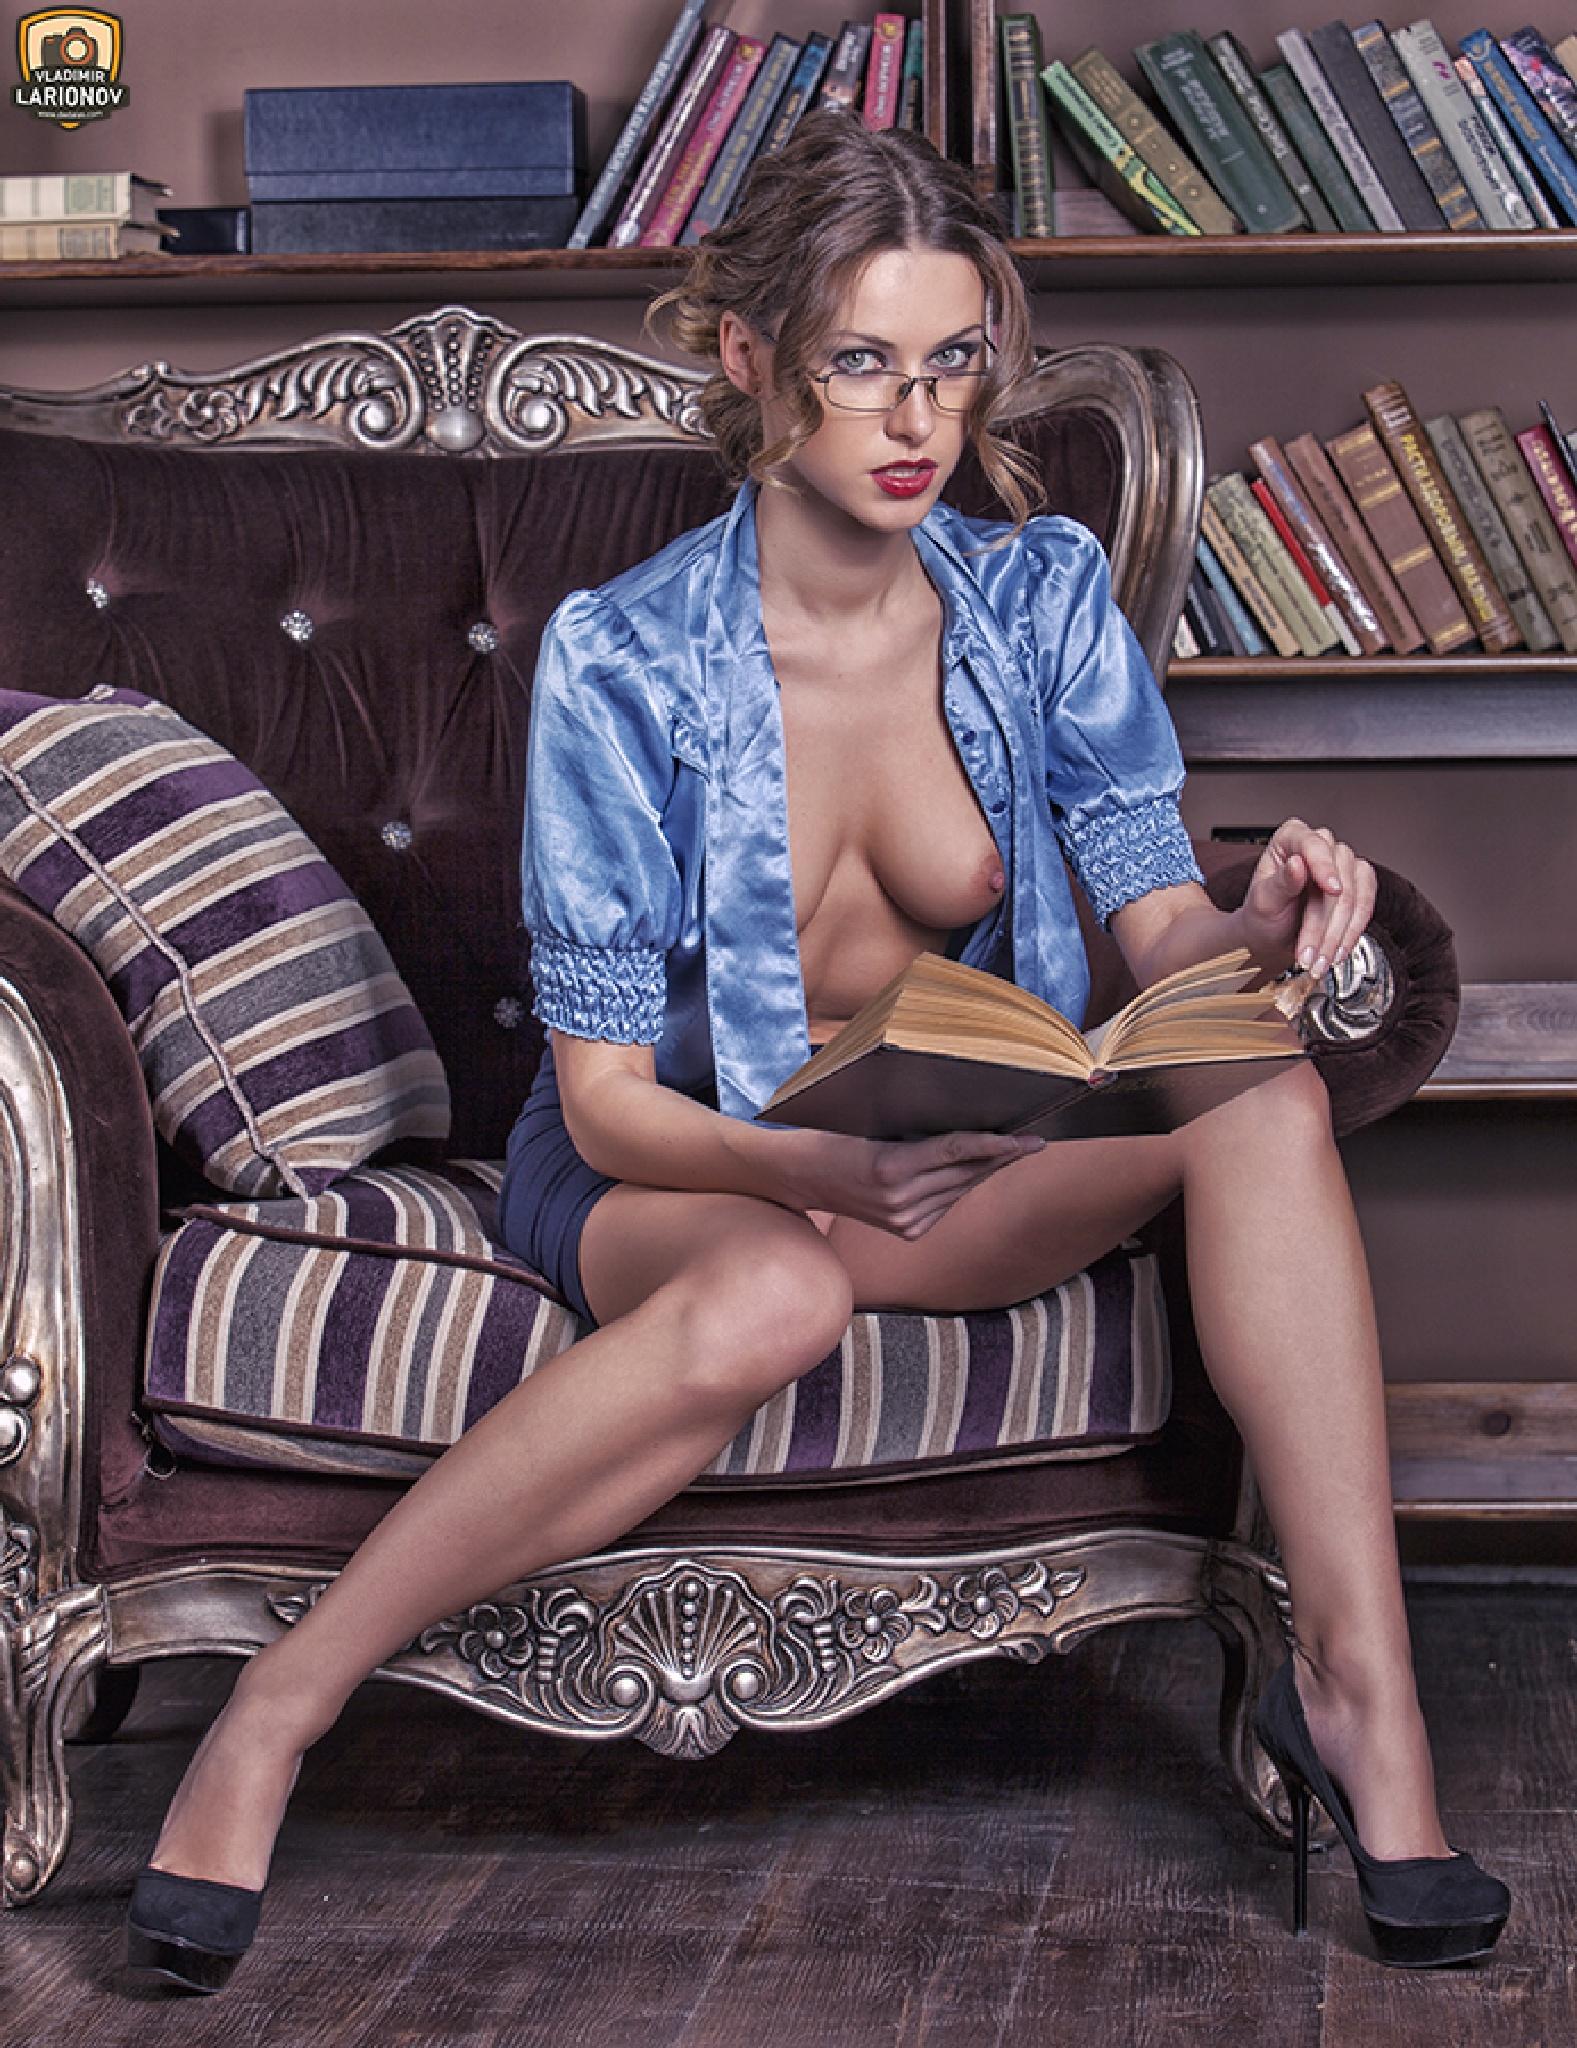 The librarian by Vladimir Larionov